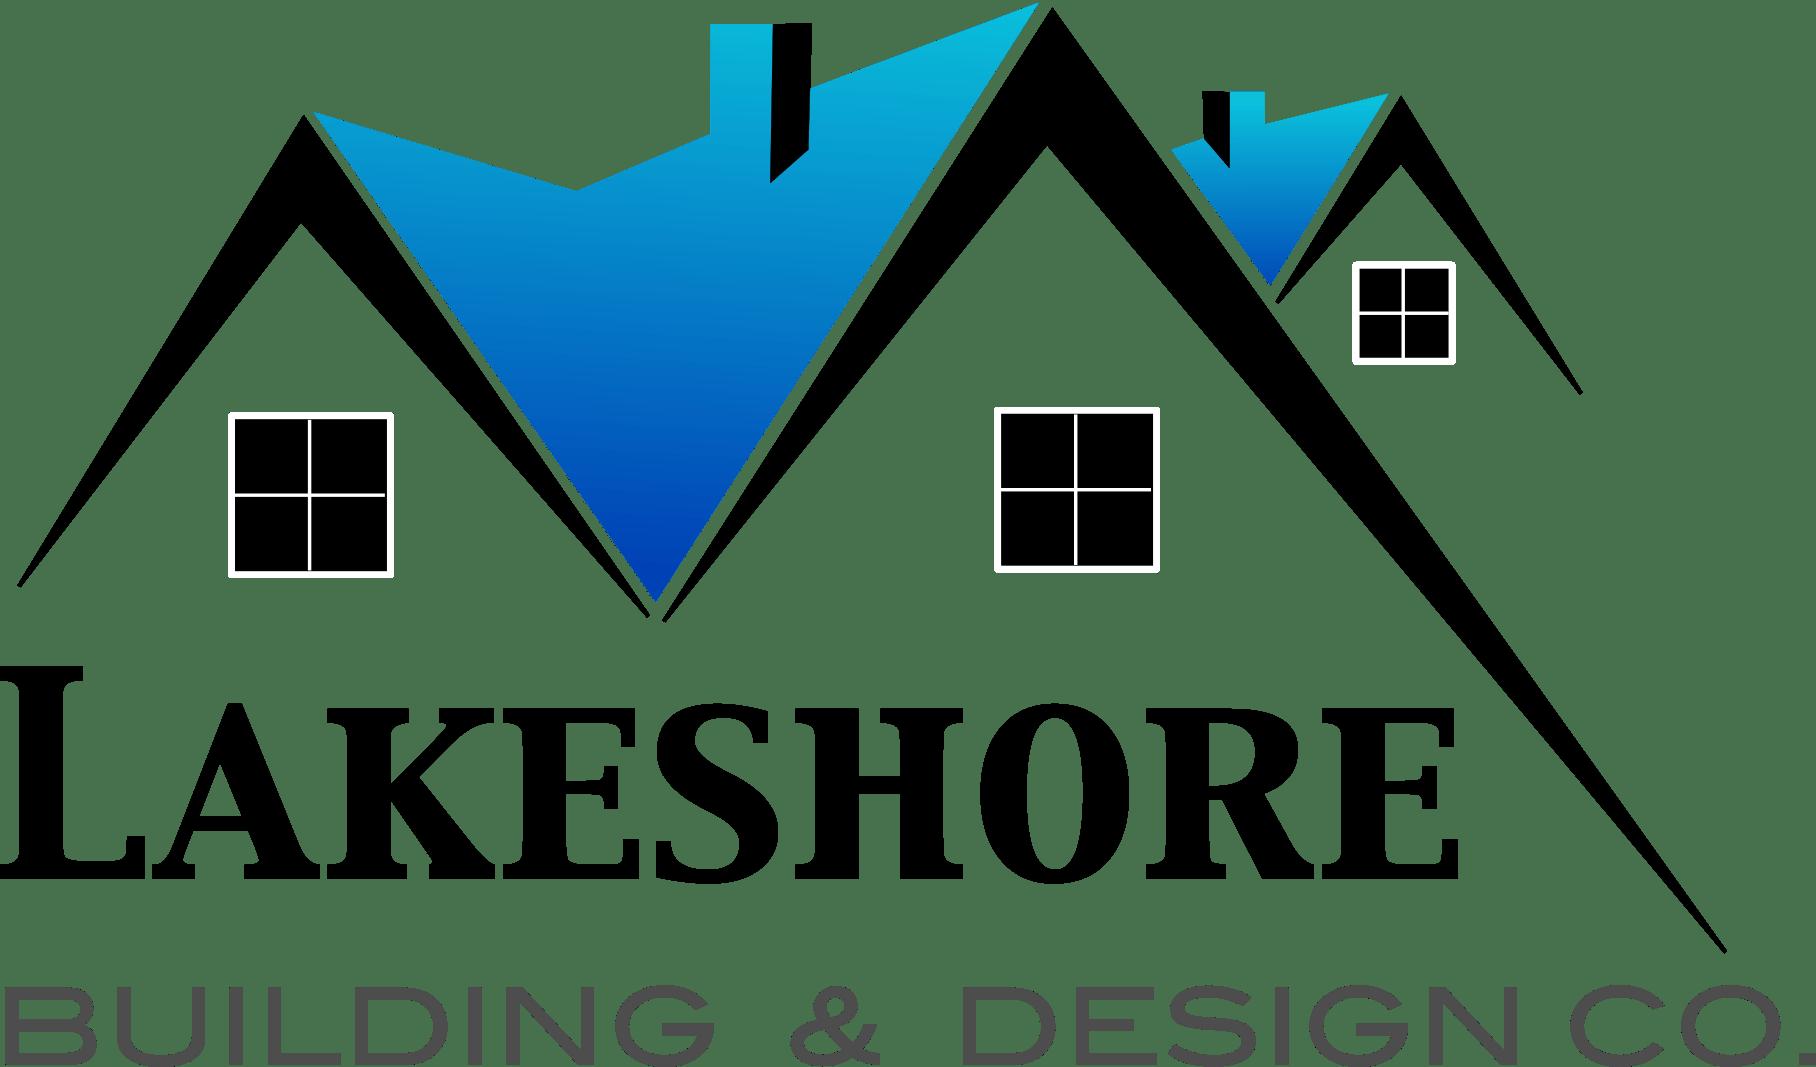 Lakeshore Building & Design Co.